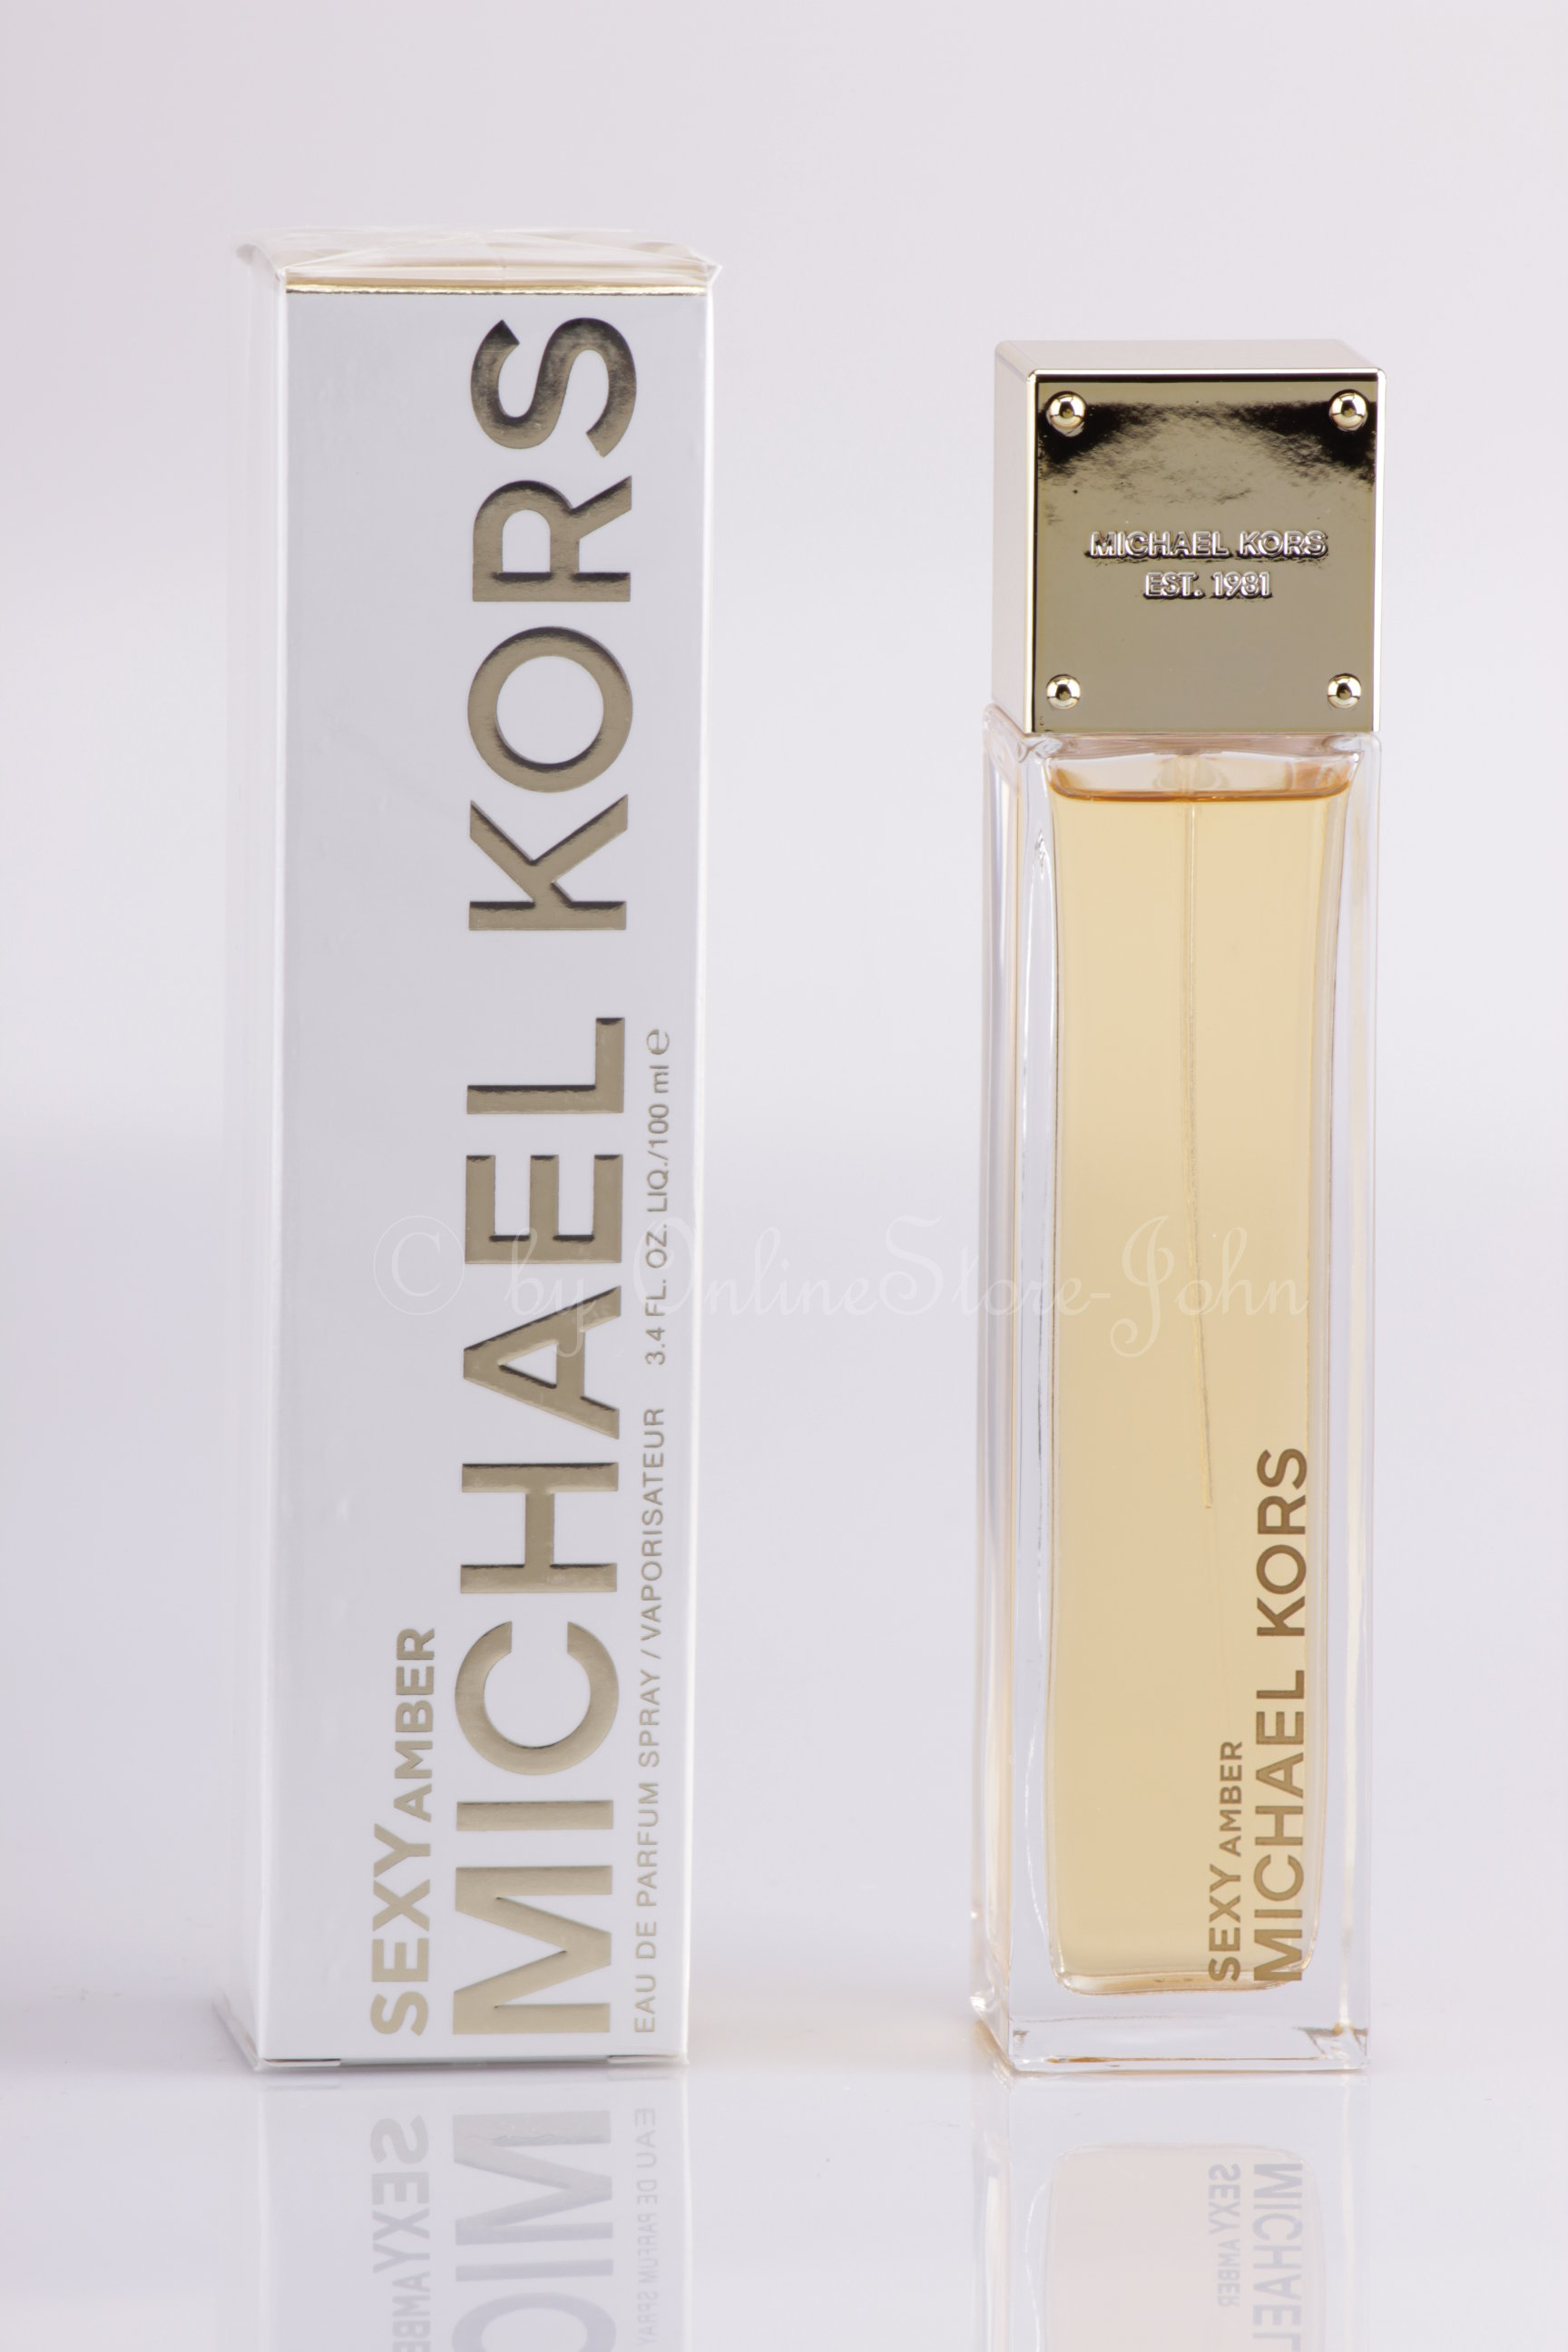 michael kors sexy amber 100ml edp eau de parfum. Black Bedroom Furniture Sets. Home Design Ideas